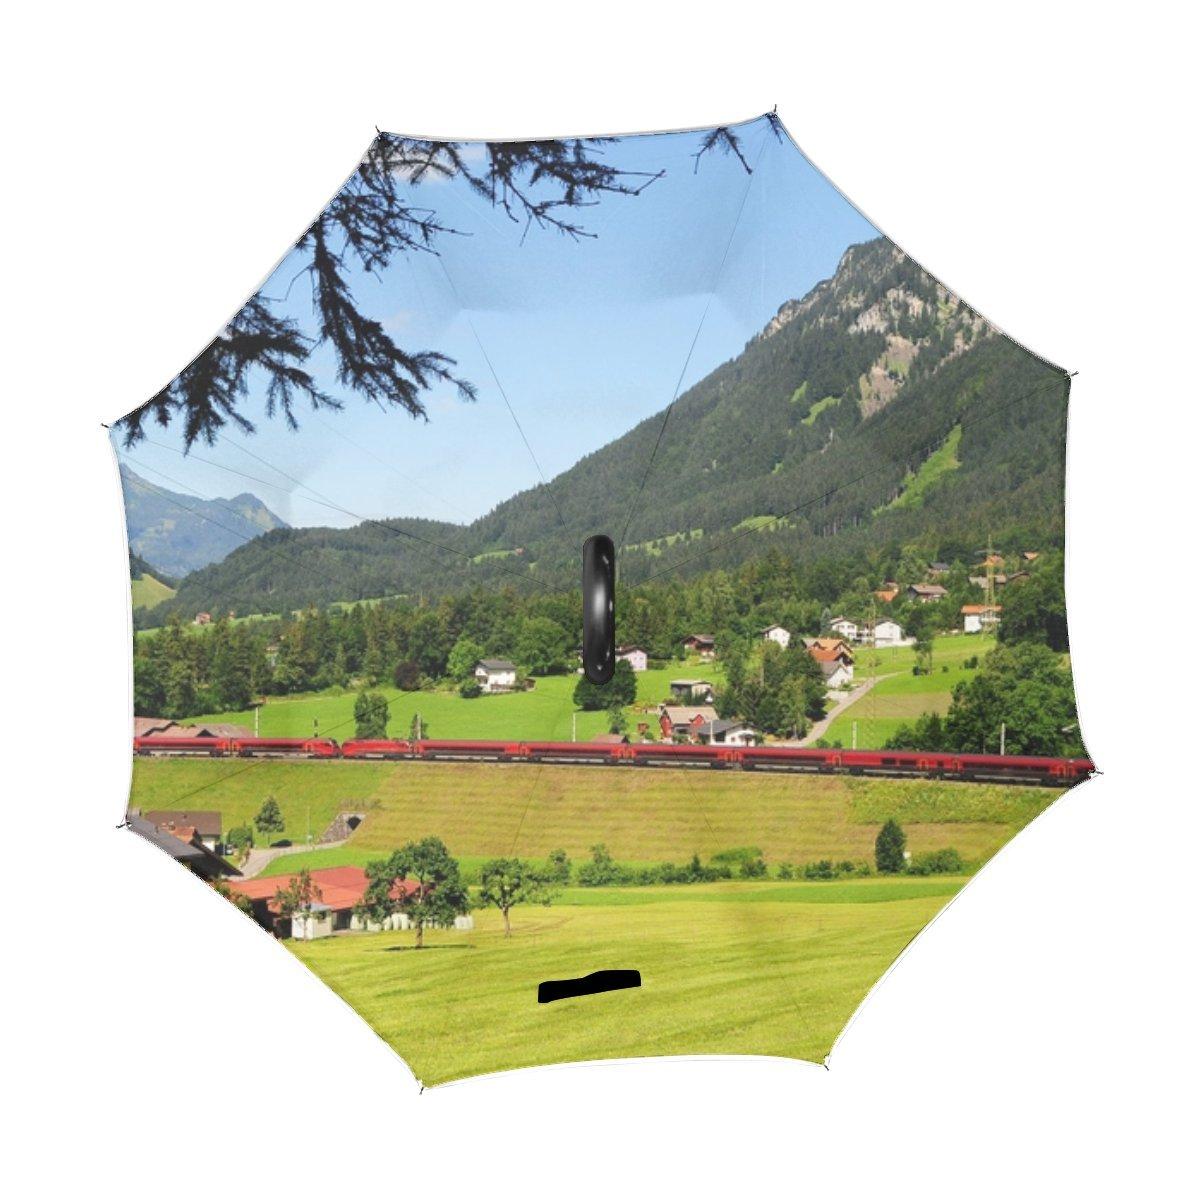 6779970b30a5 Amazon.com : RH Studio Inverted Umbrella Austria Mountains Grass ...